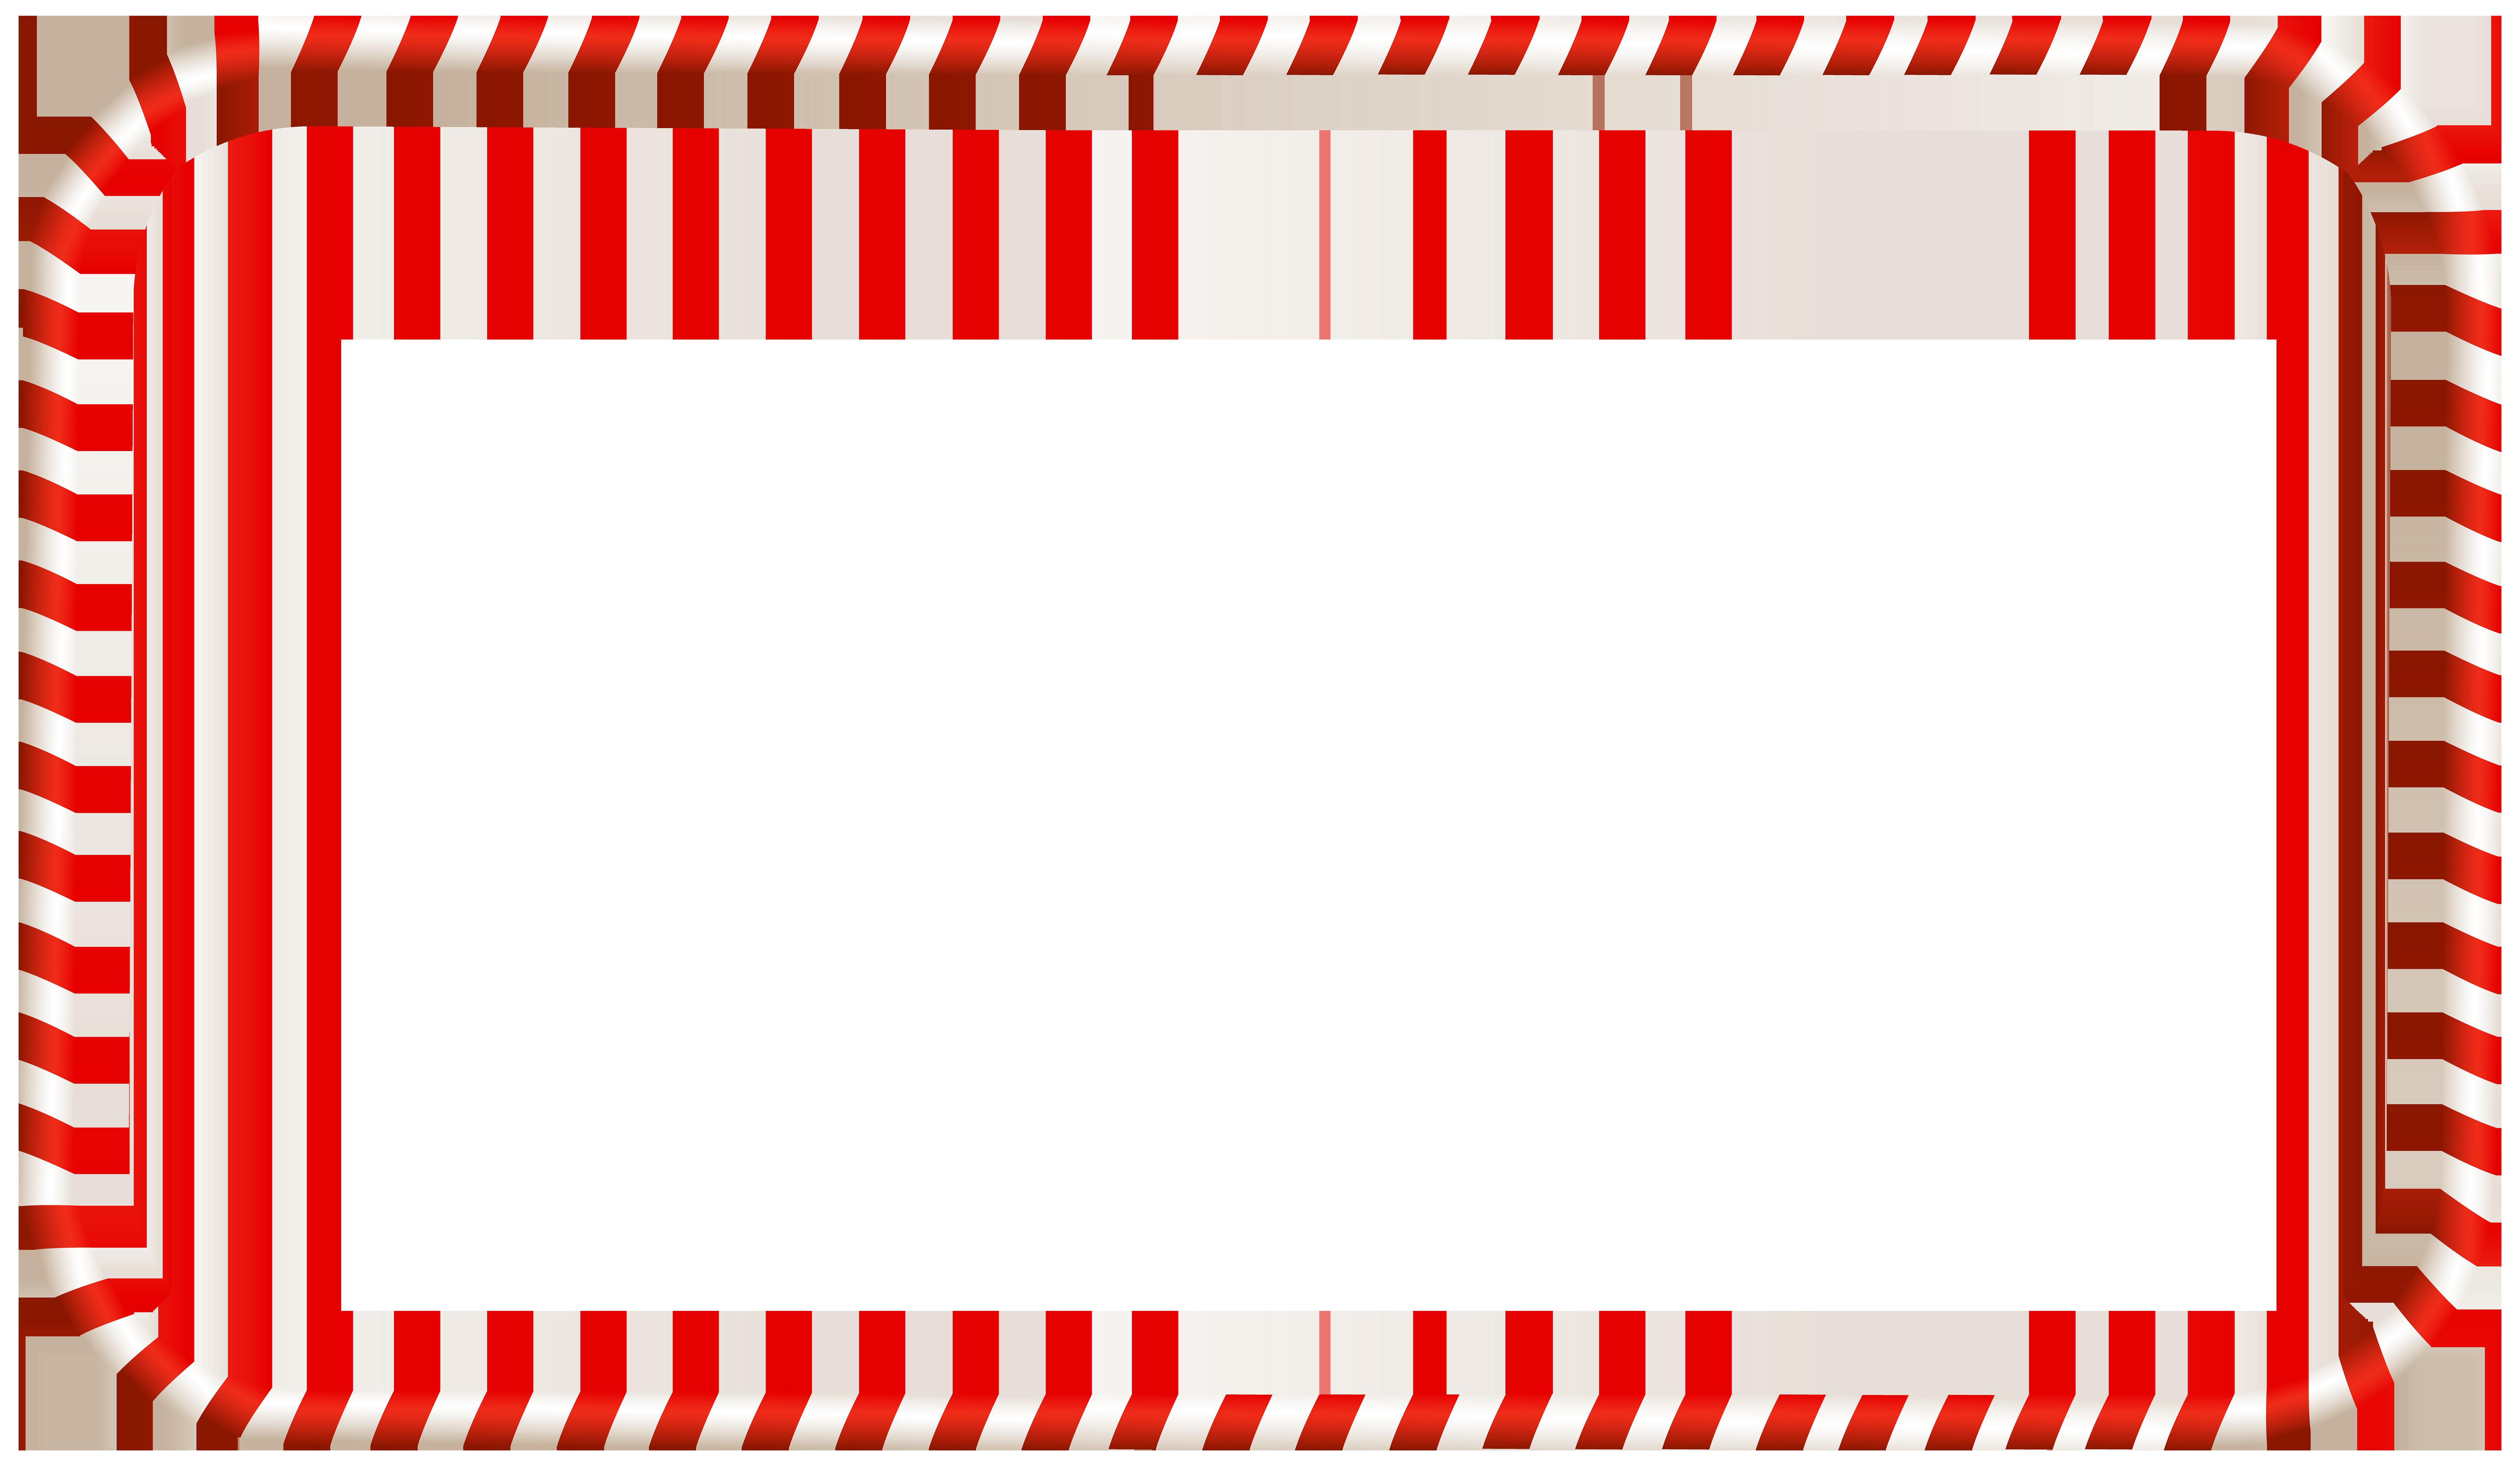 Christmas Candy Frame Transparent Png Clip Art Candy Cane Christmas Frame Clipart Christmas Candy